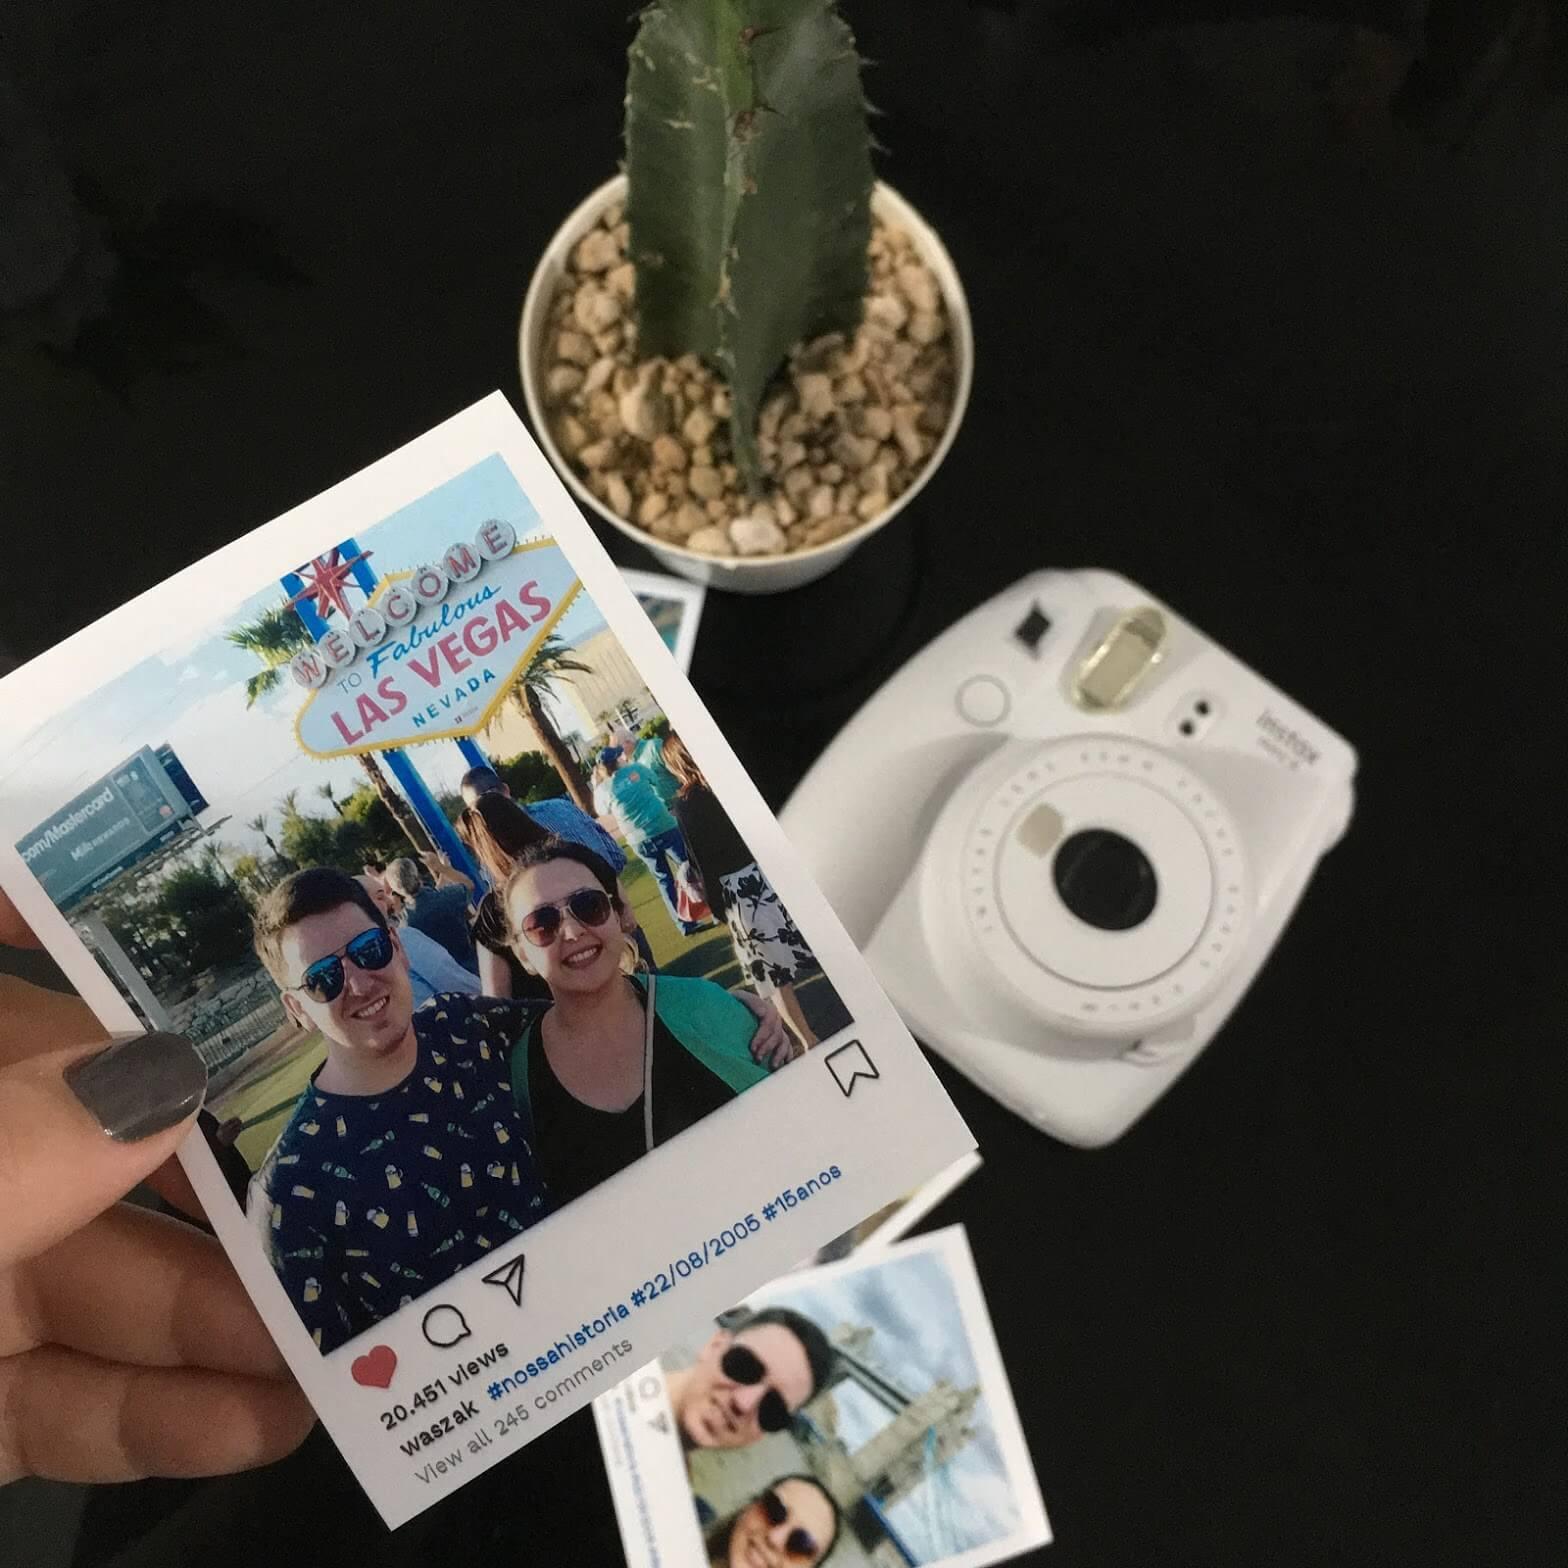 foto polaroid formato instagram